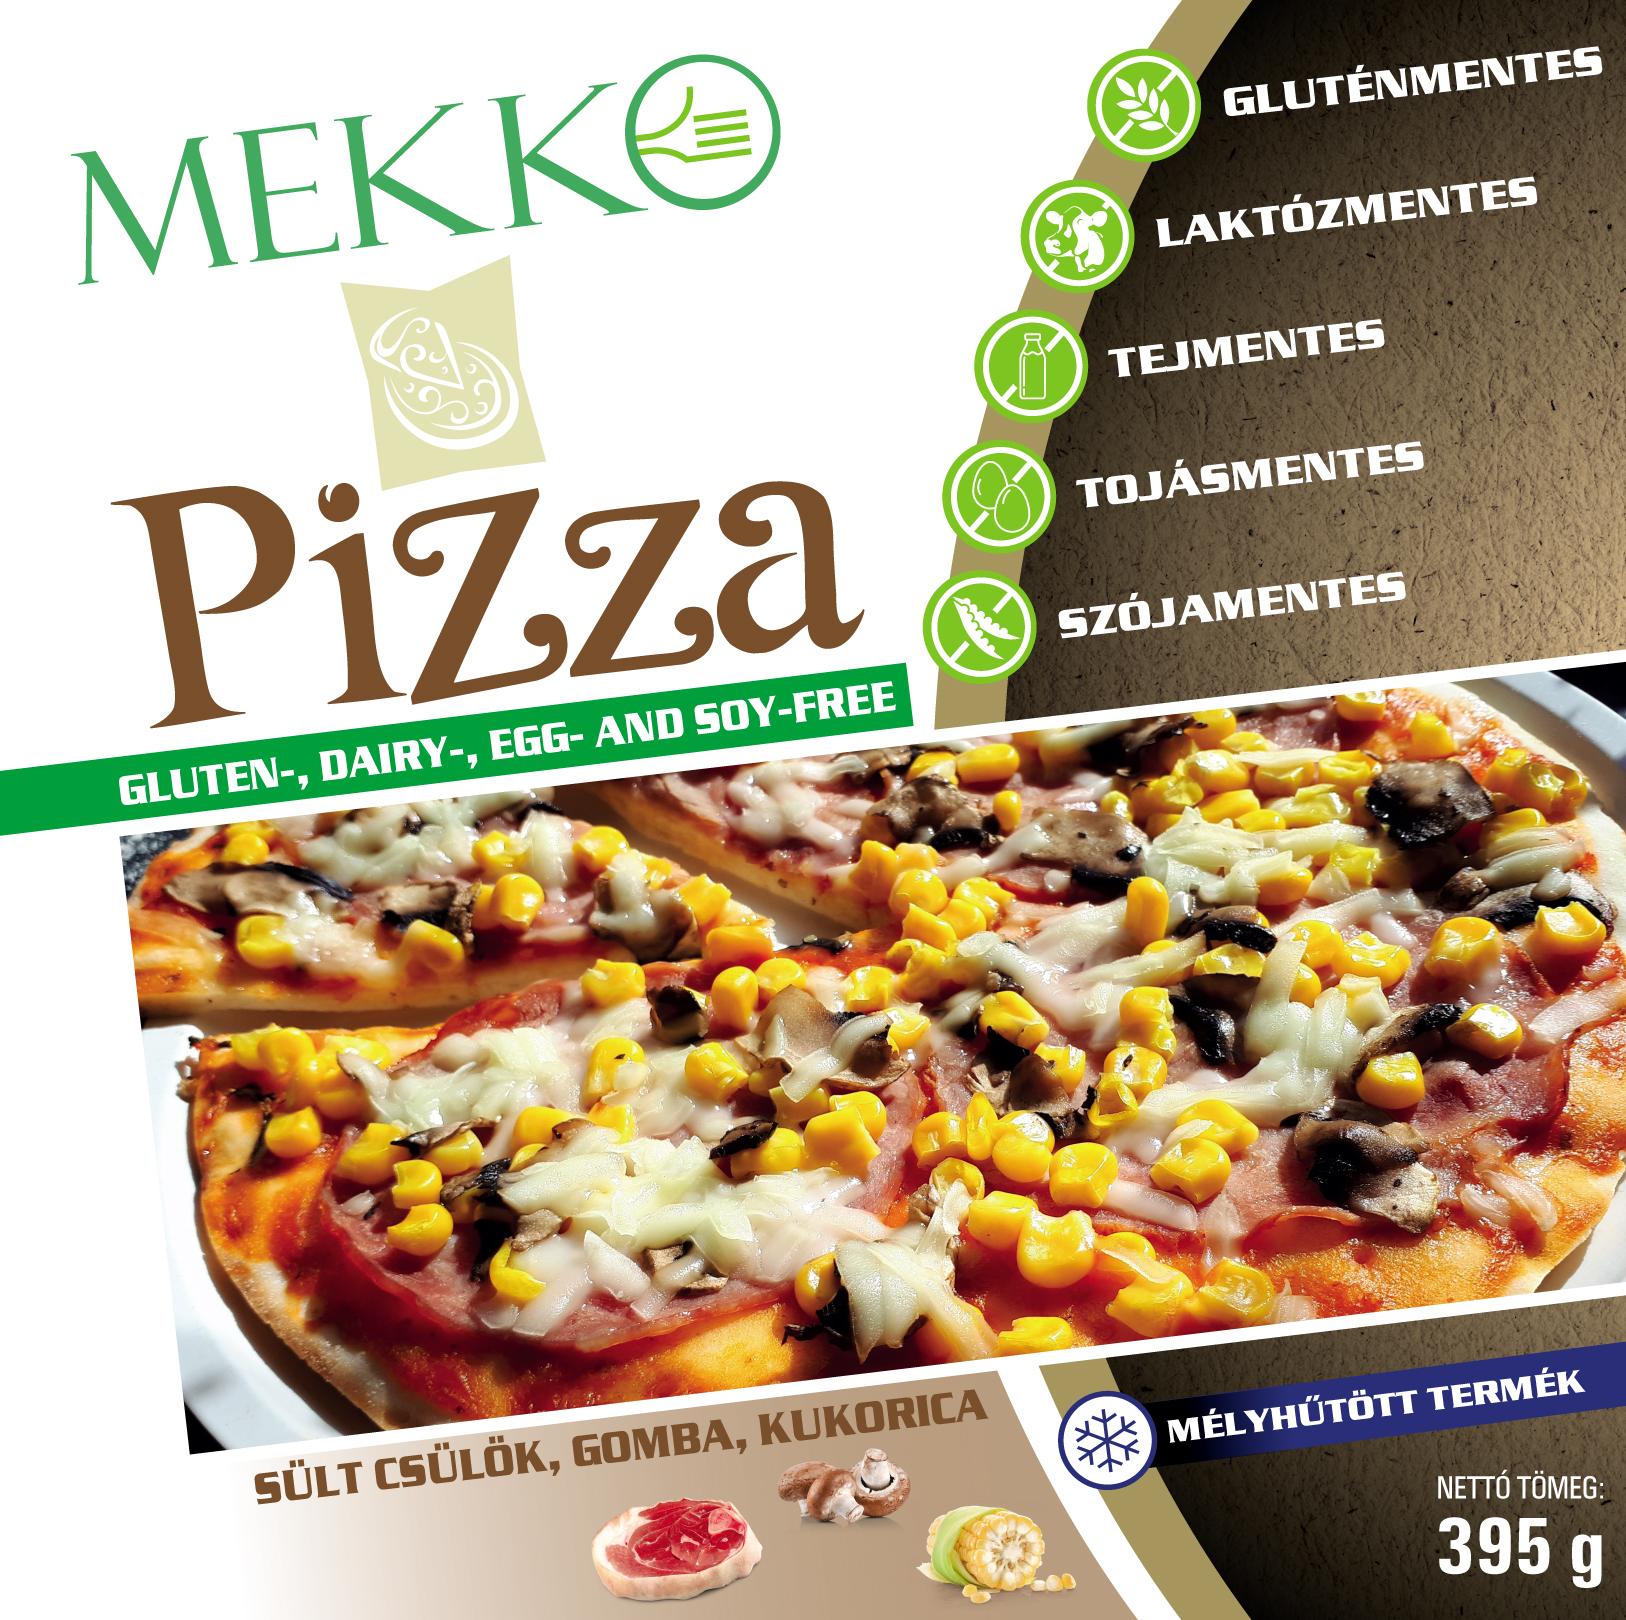 MEKKO Allergenmentes pizza csulok, gomba, kukorica 395g